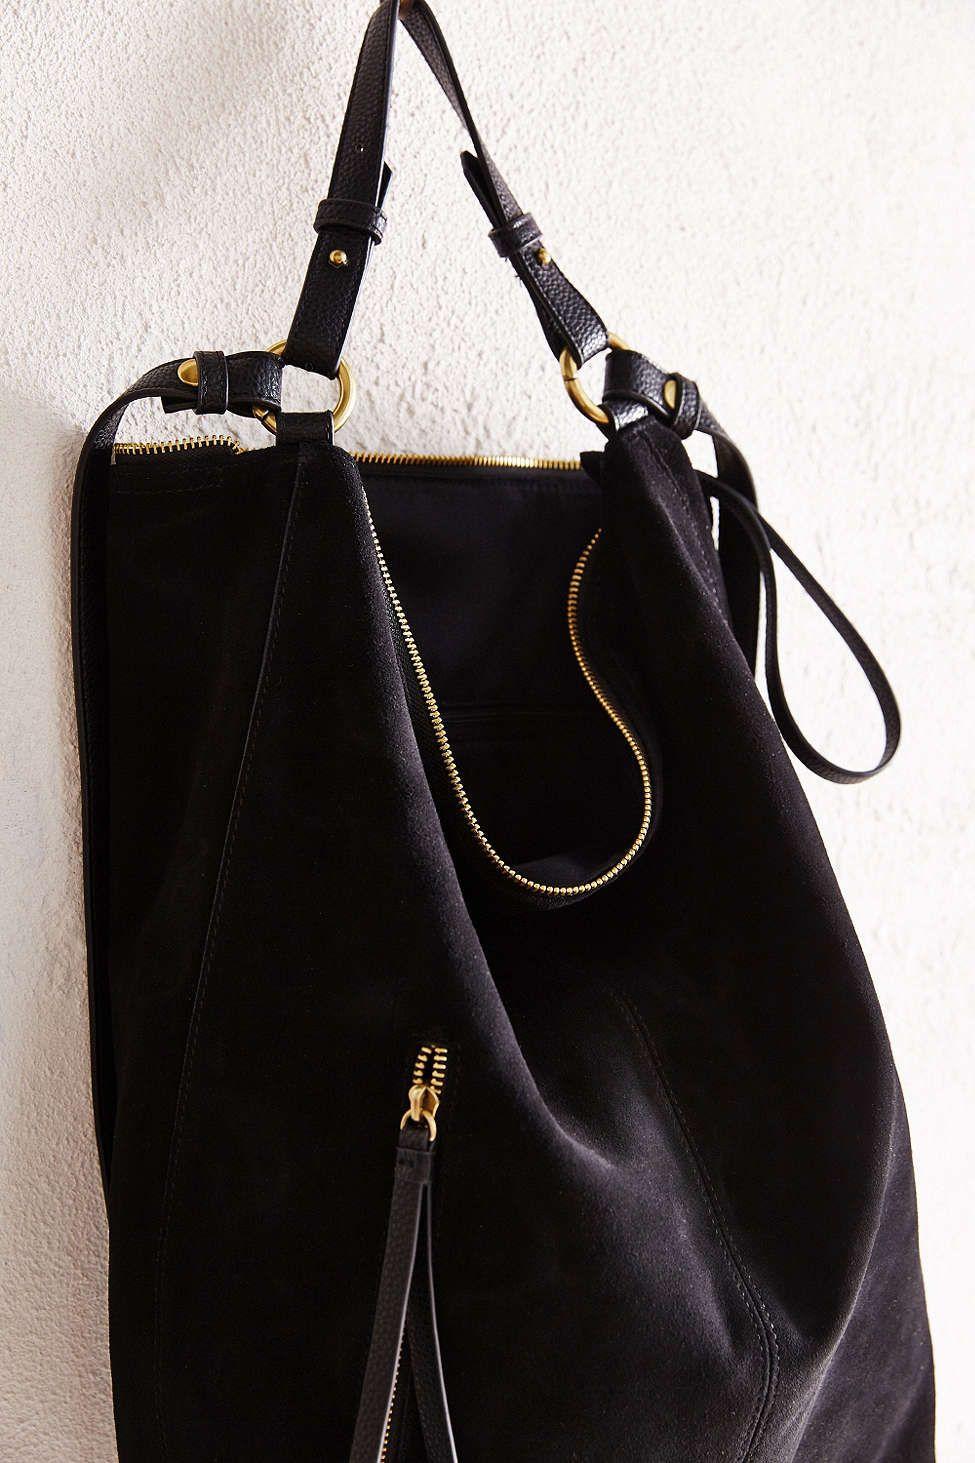 32f75e2b7d0 Leather Convertible Backpack Shoulder Bag - CEAGESP